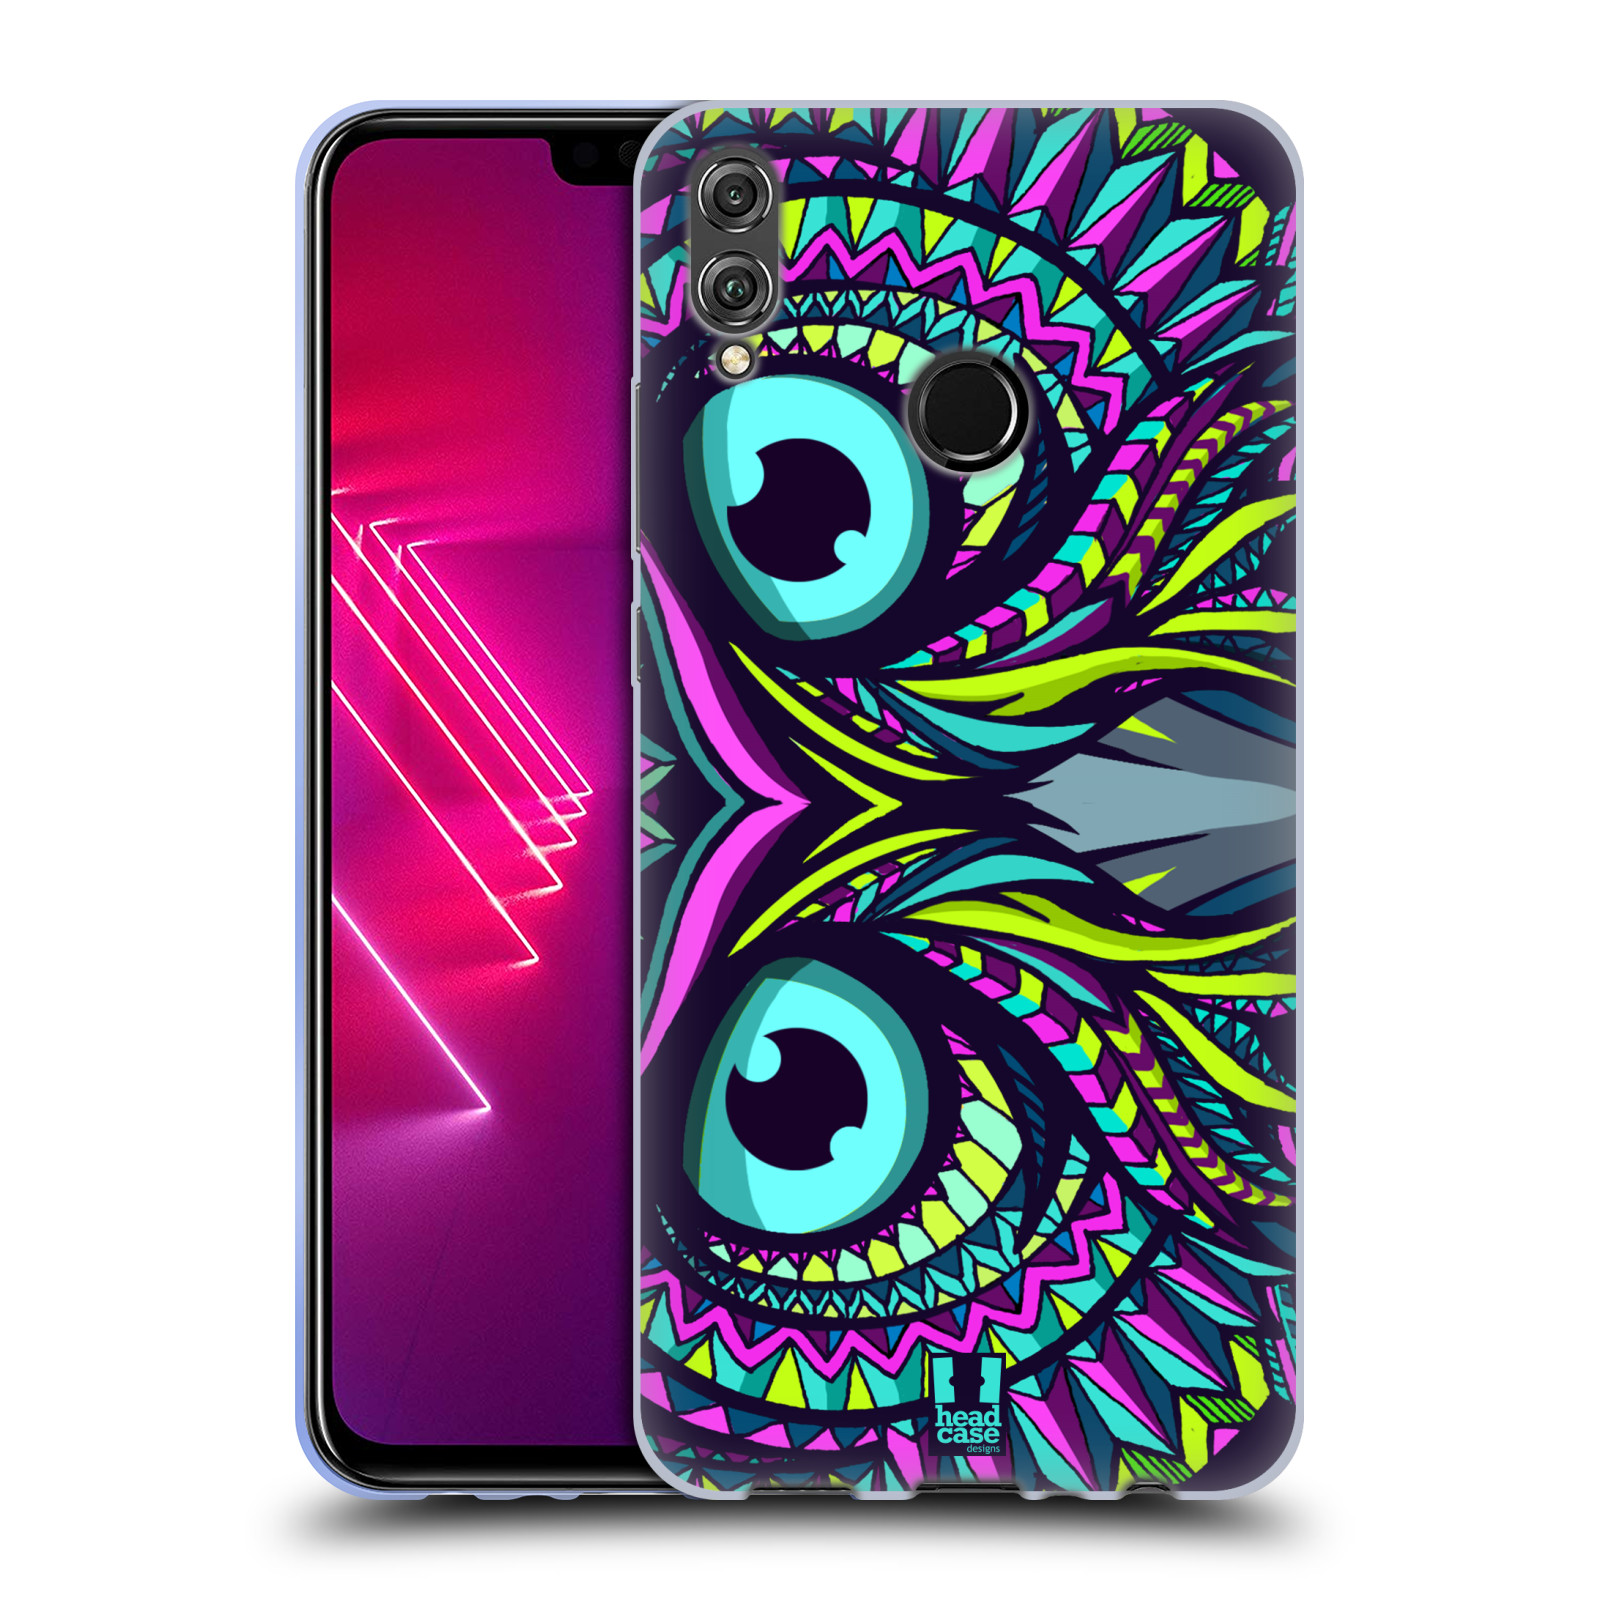 Silikonové pouzdro na mobil Honor View 10 Lite - Head Case - AZTEC SOVA